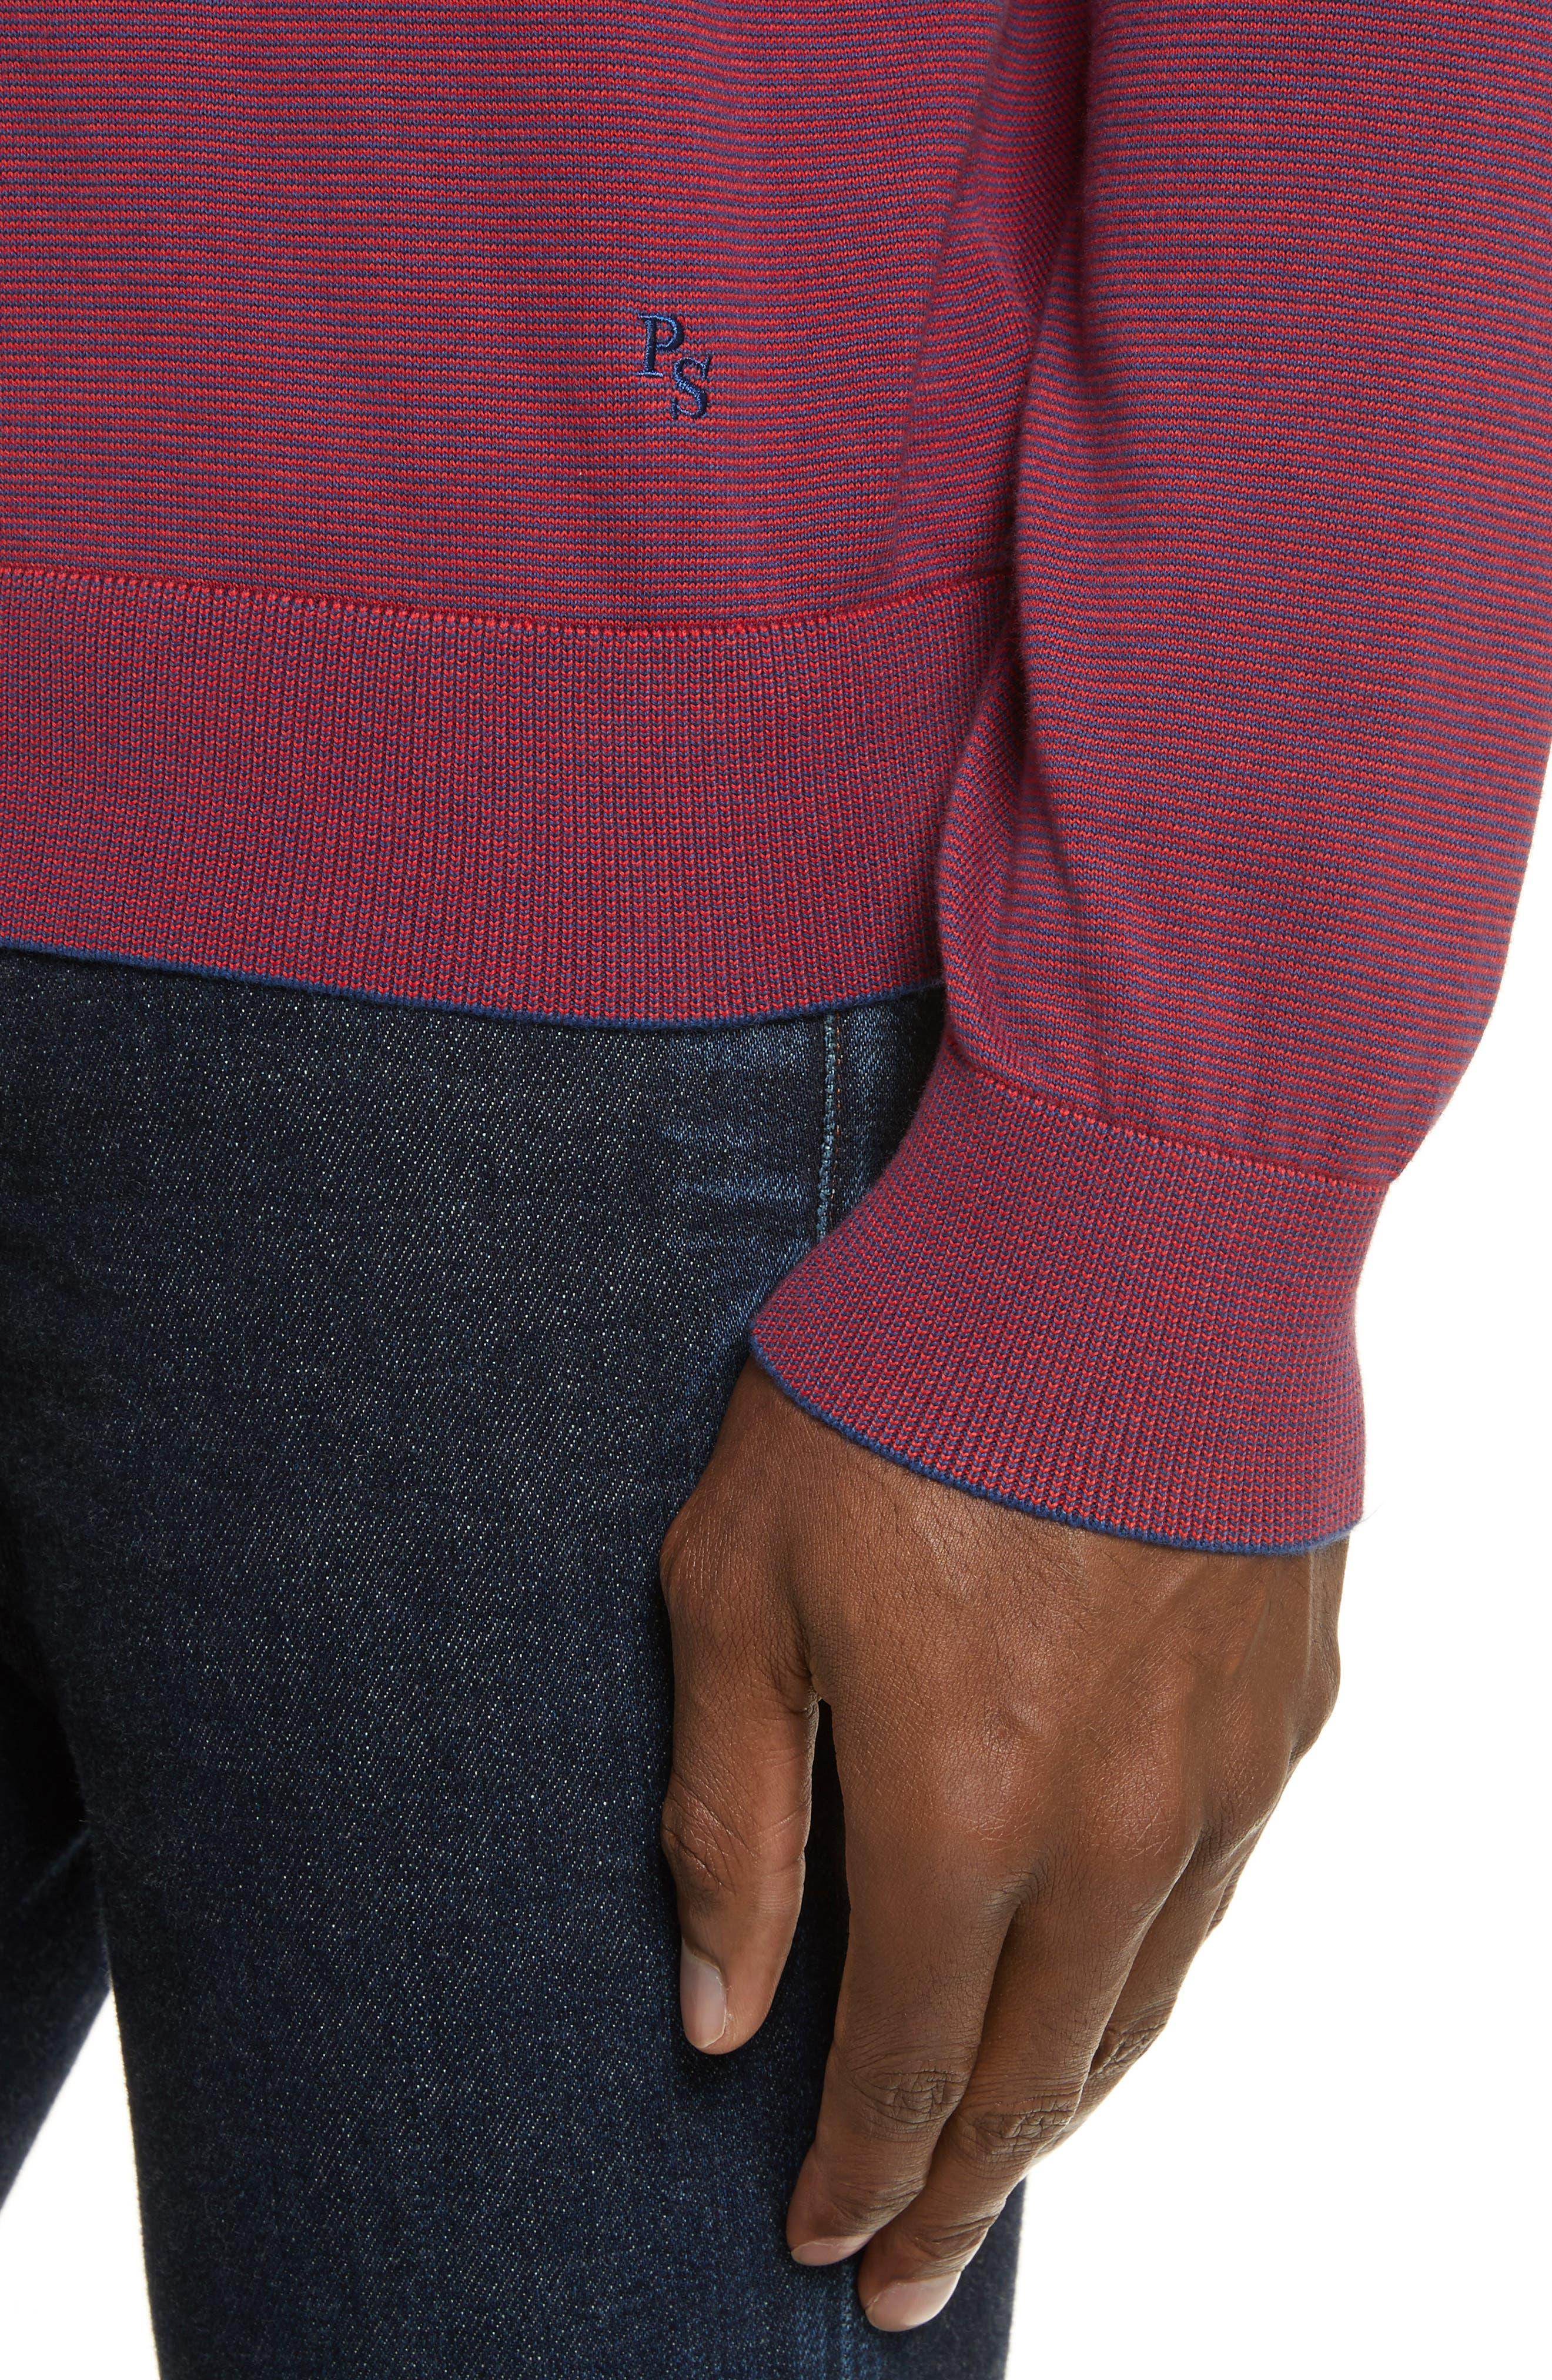 Ministripe Crewneck Sweater,                             Alternate thumbnail 4, color,                             415